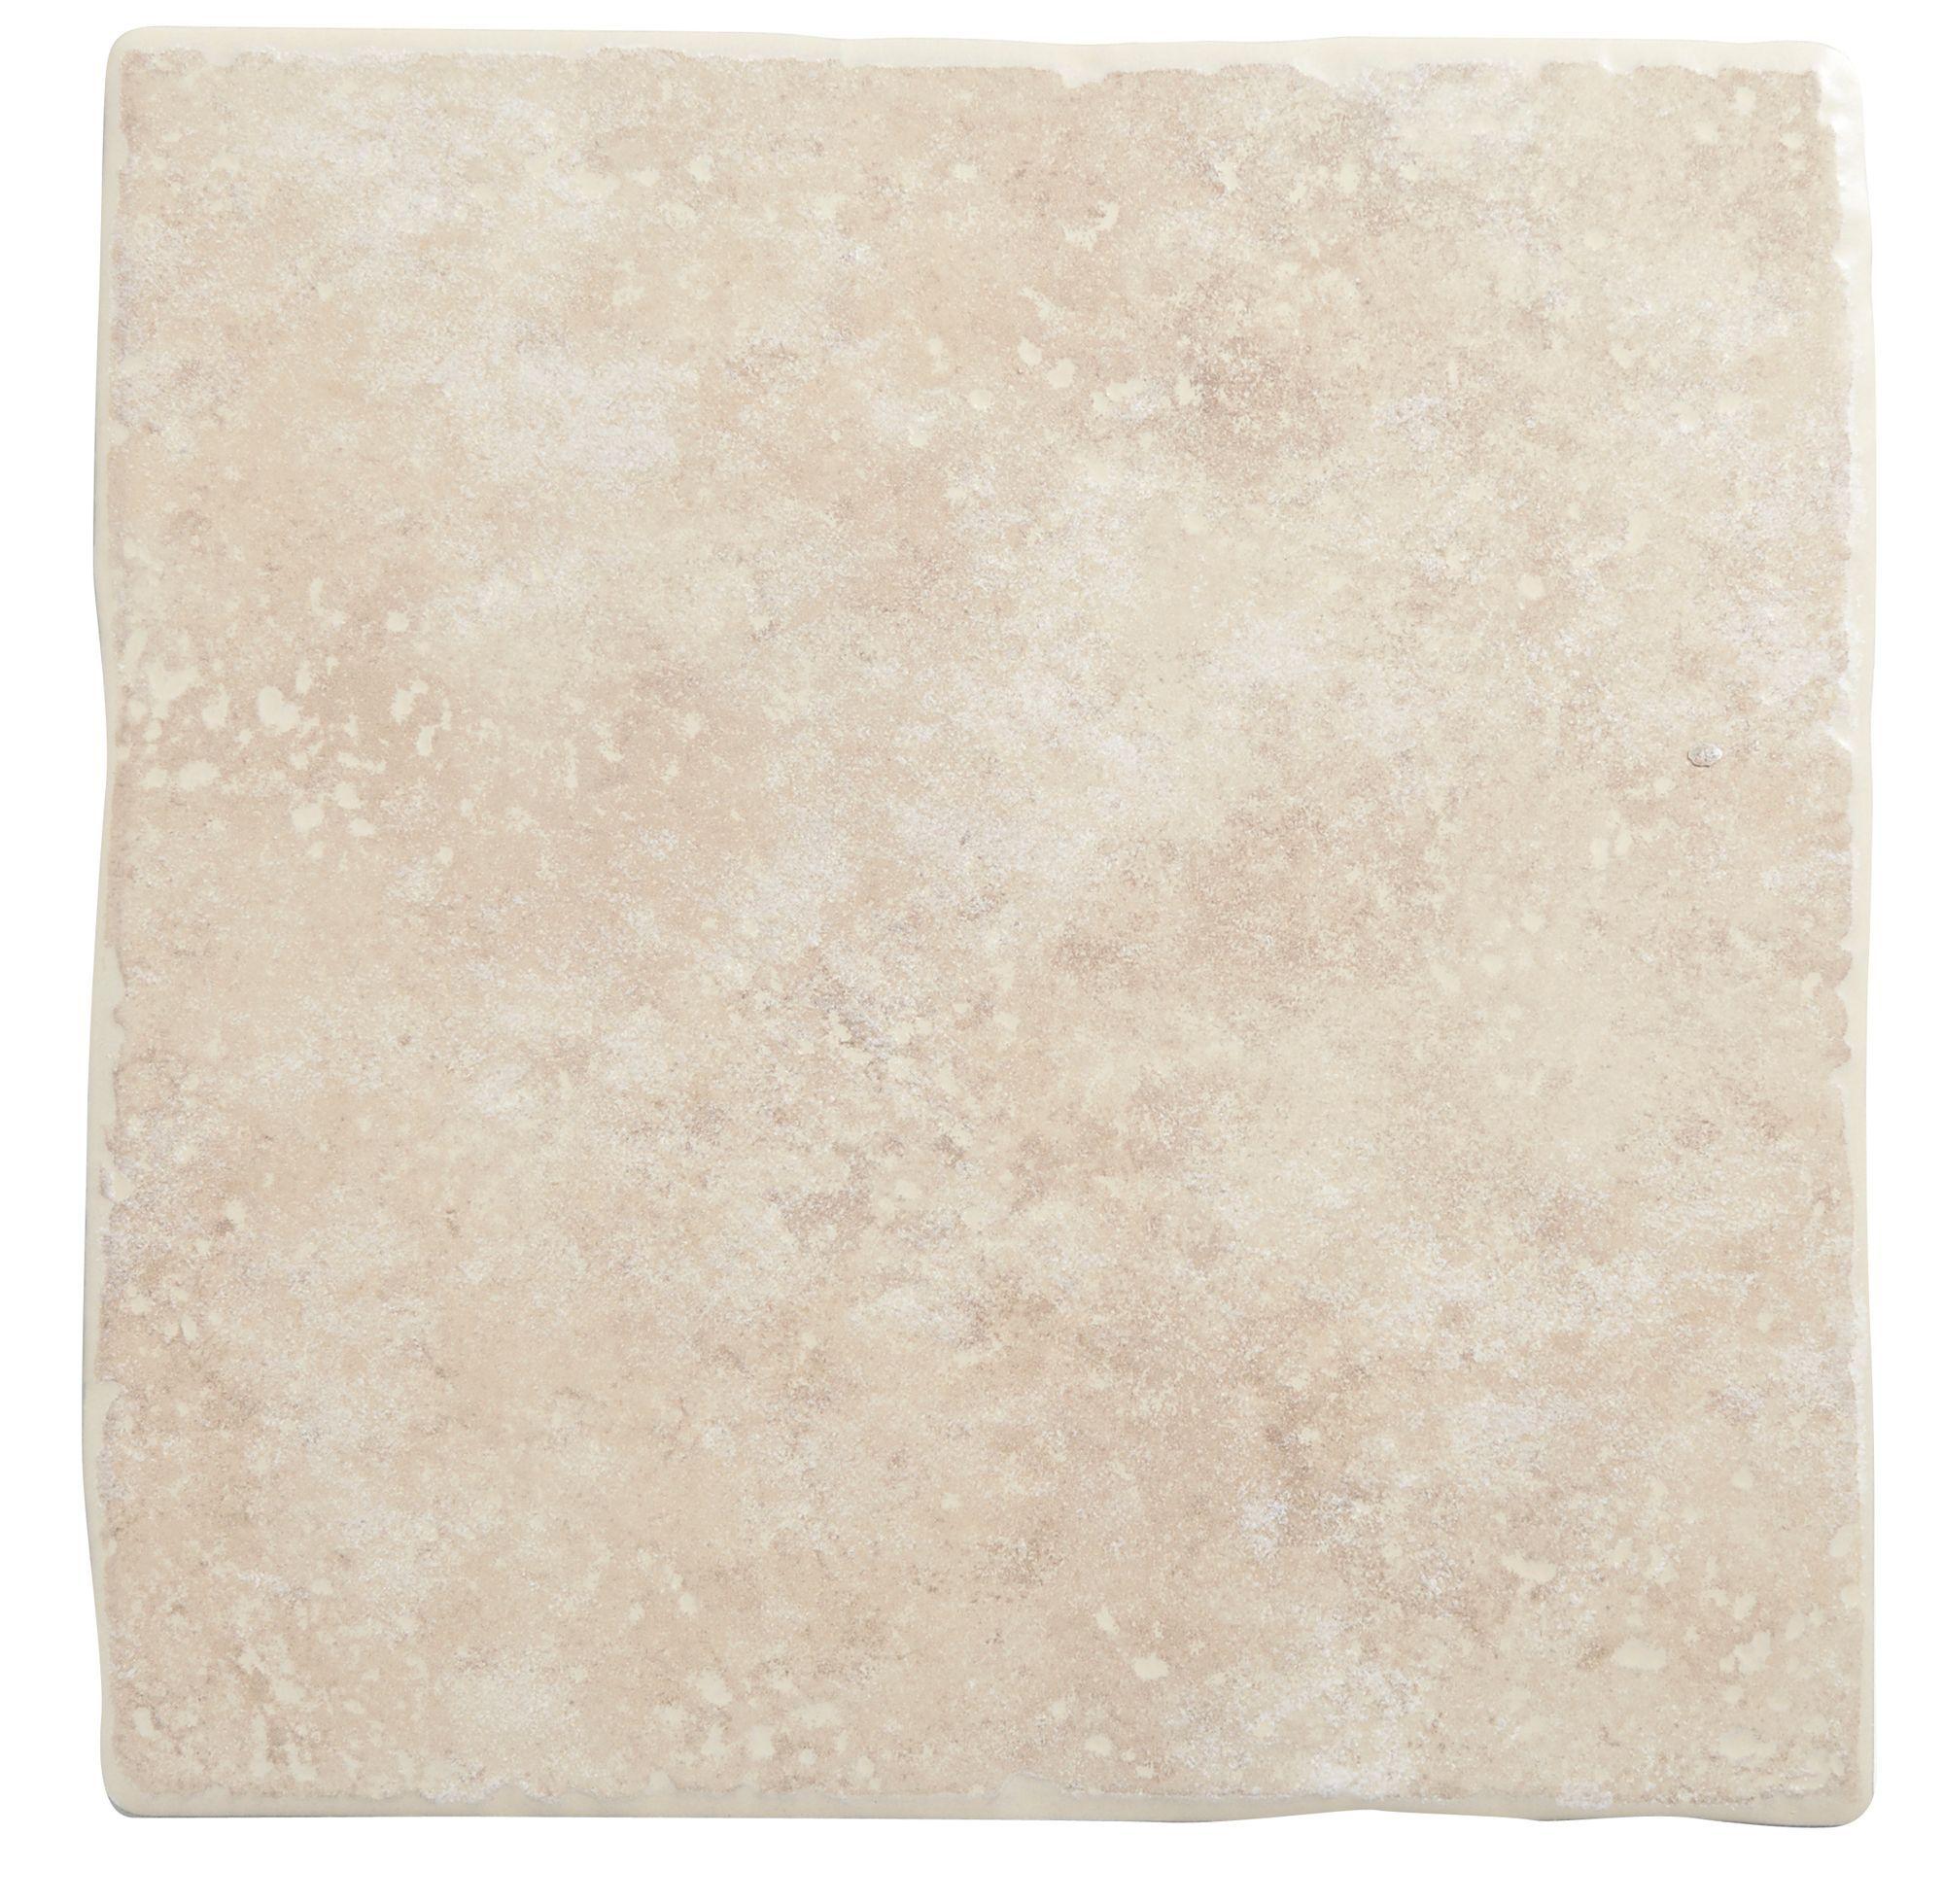 Calcuta Natural Stone Effect Ceramic Floor Tile, Pack of 9, (L)330mm ...